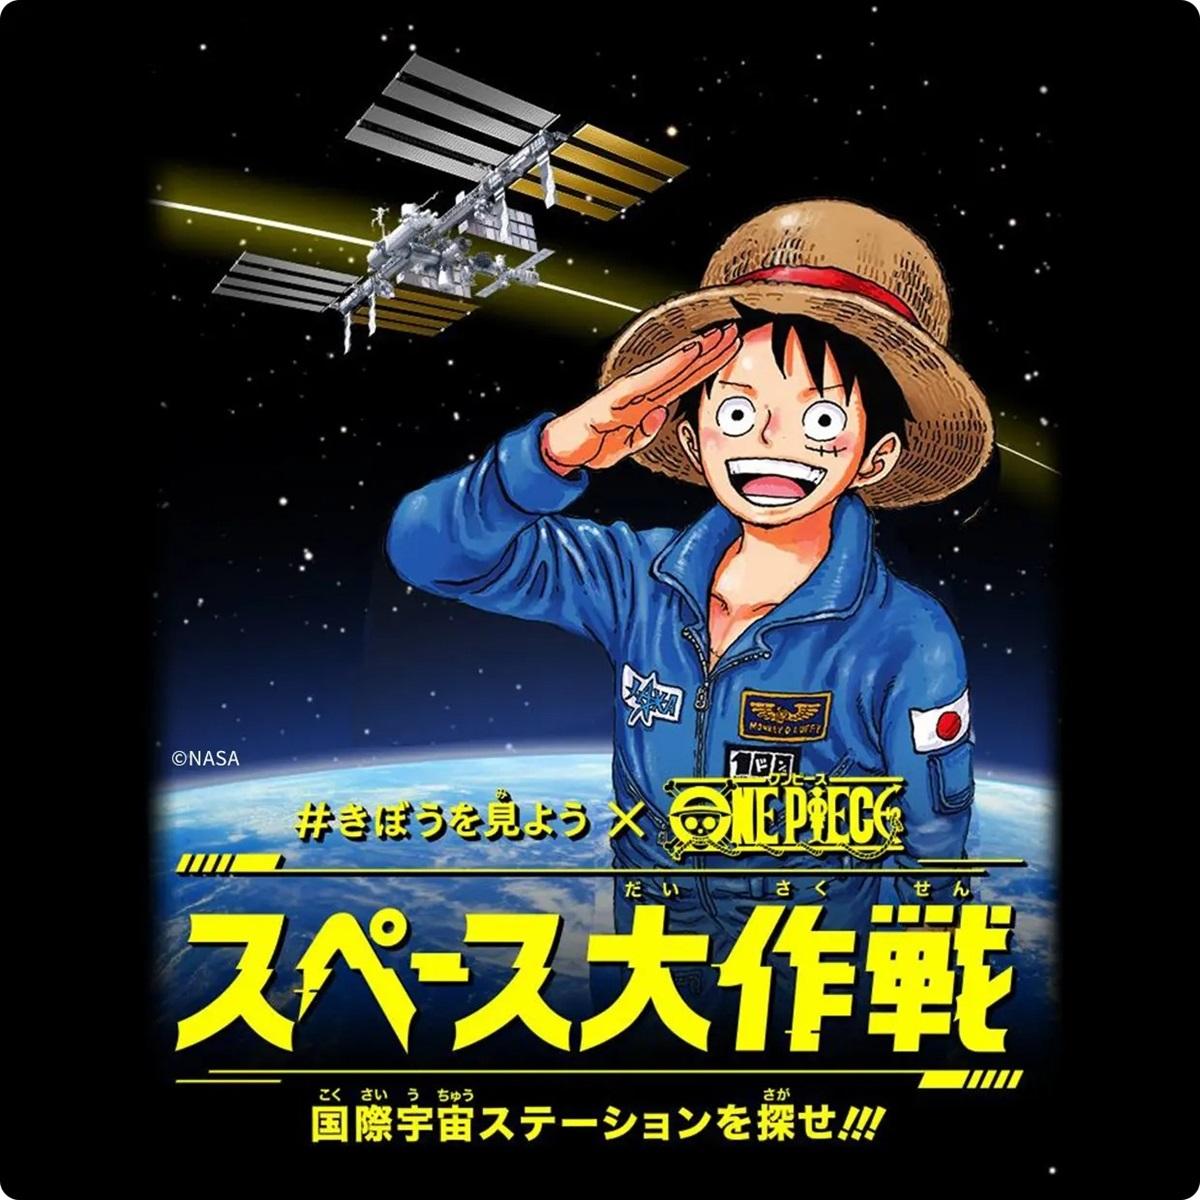 ARガイドで国際宇宙ステーションを発見!「KIBO DISCOVER PROJECT」が始動